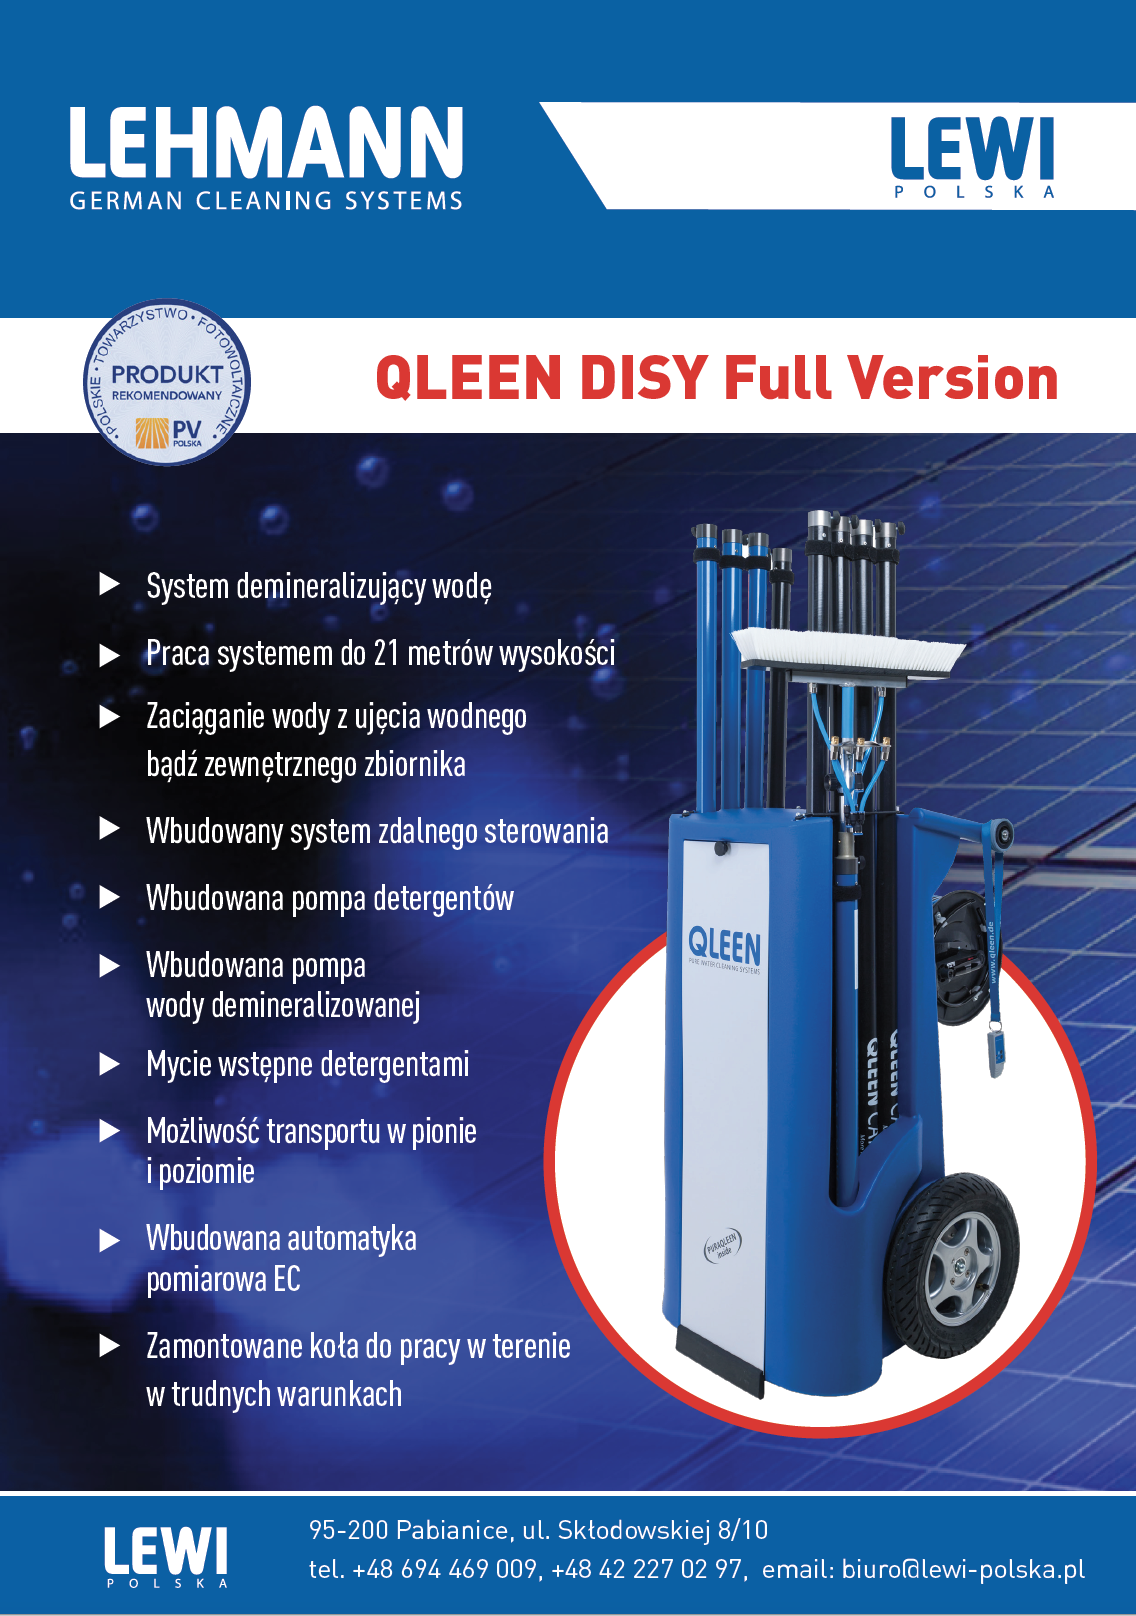 QLEEN DISY Full Version